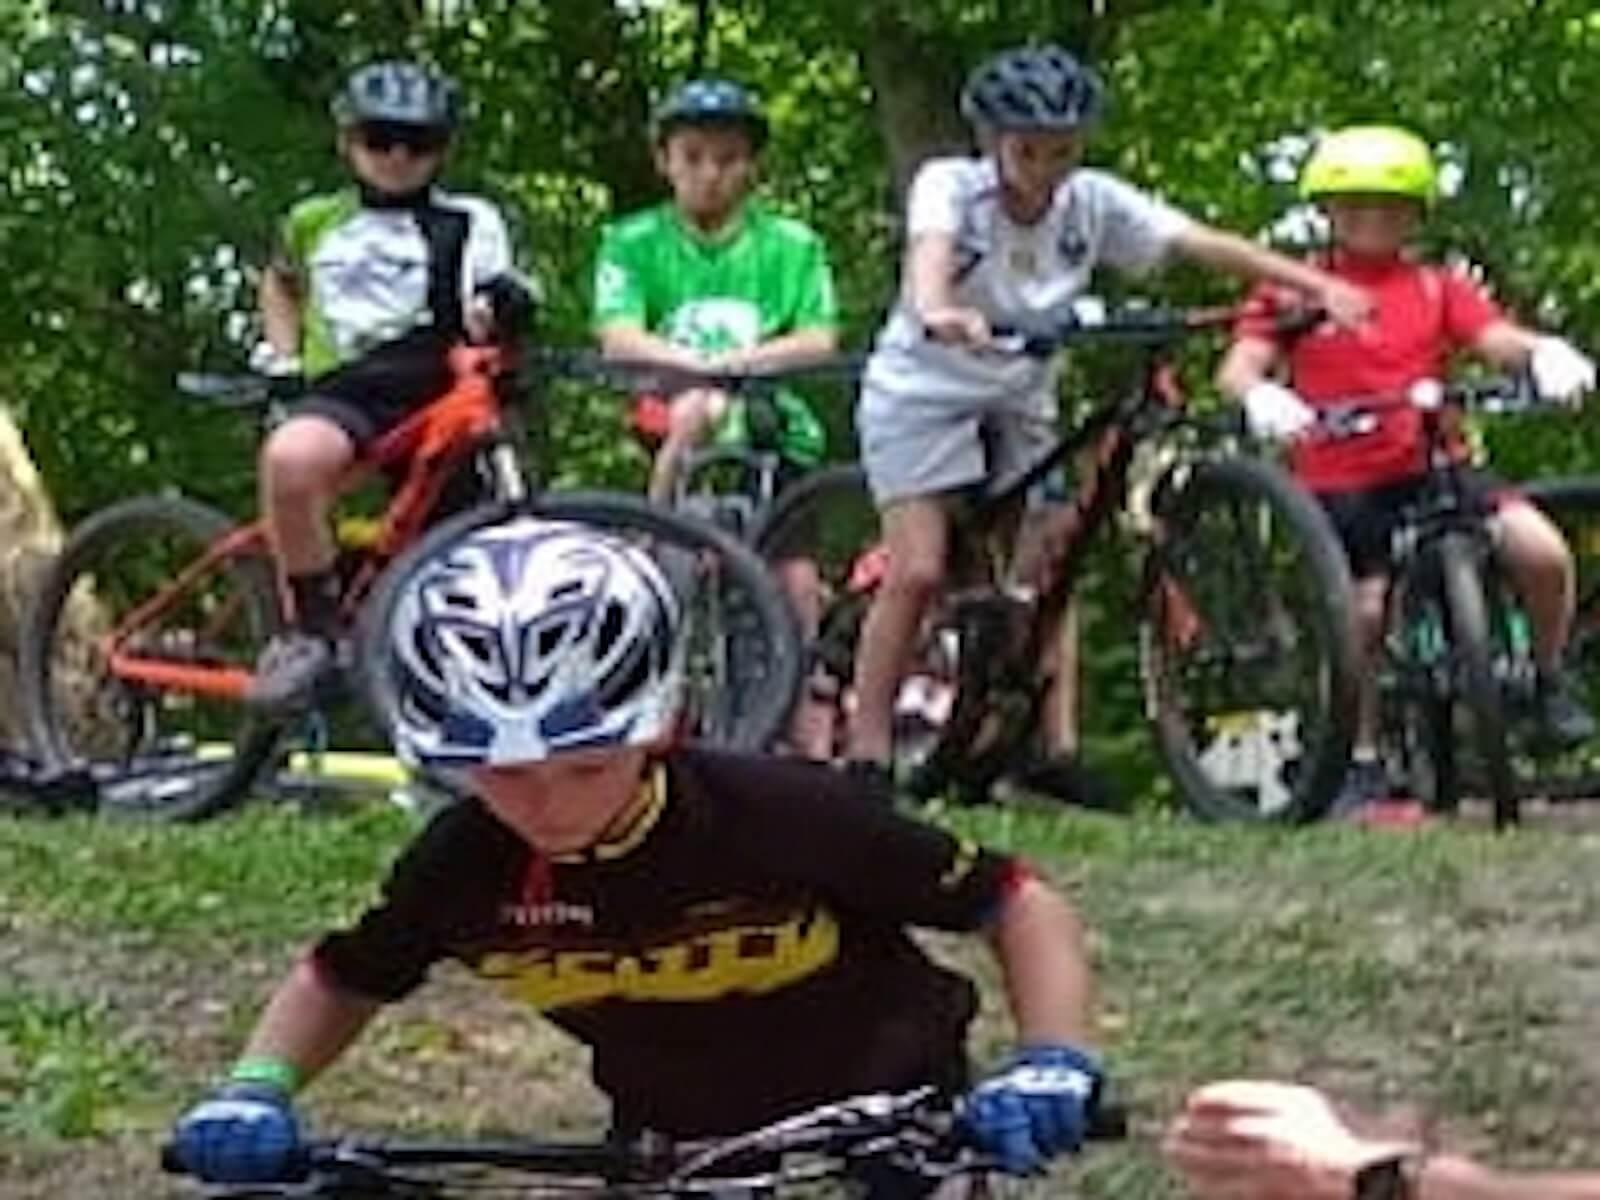 https://apps.tourisme-alsace.info/photos/kaysersberg/photos/cours-velo-biker-go-loisirs.jpg